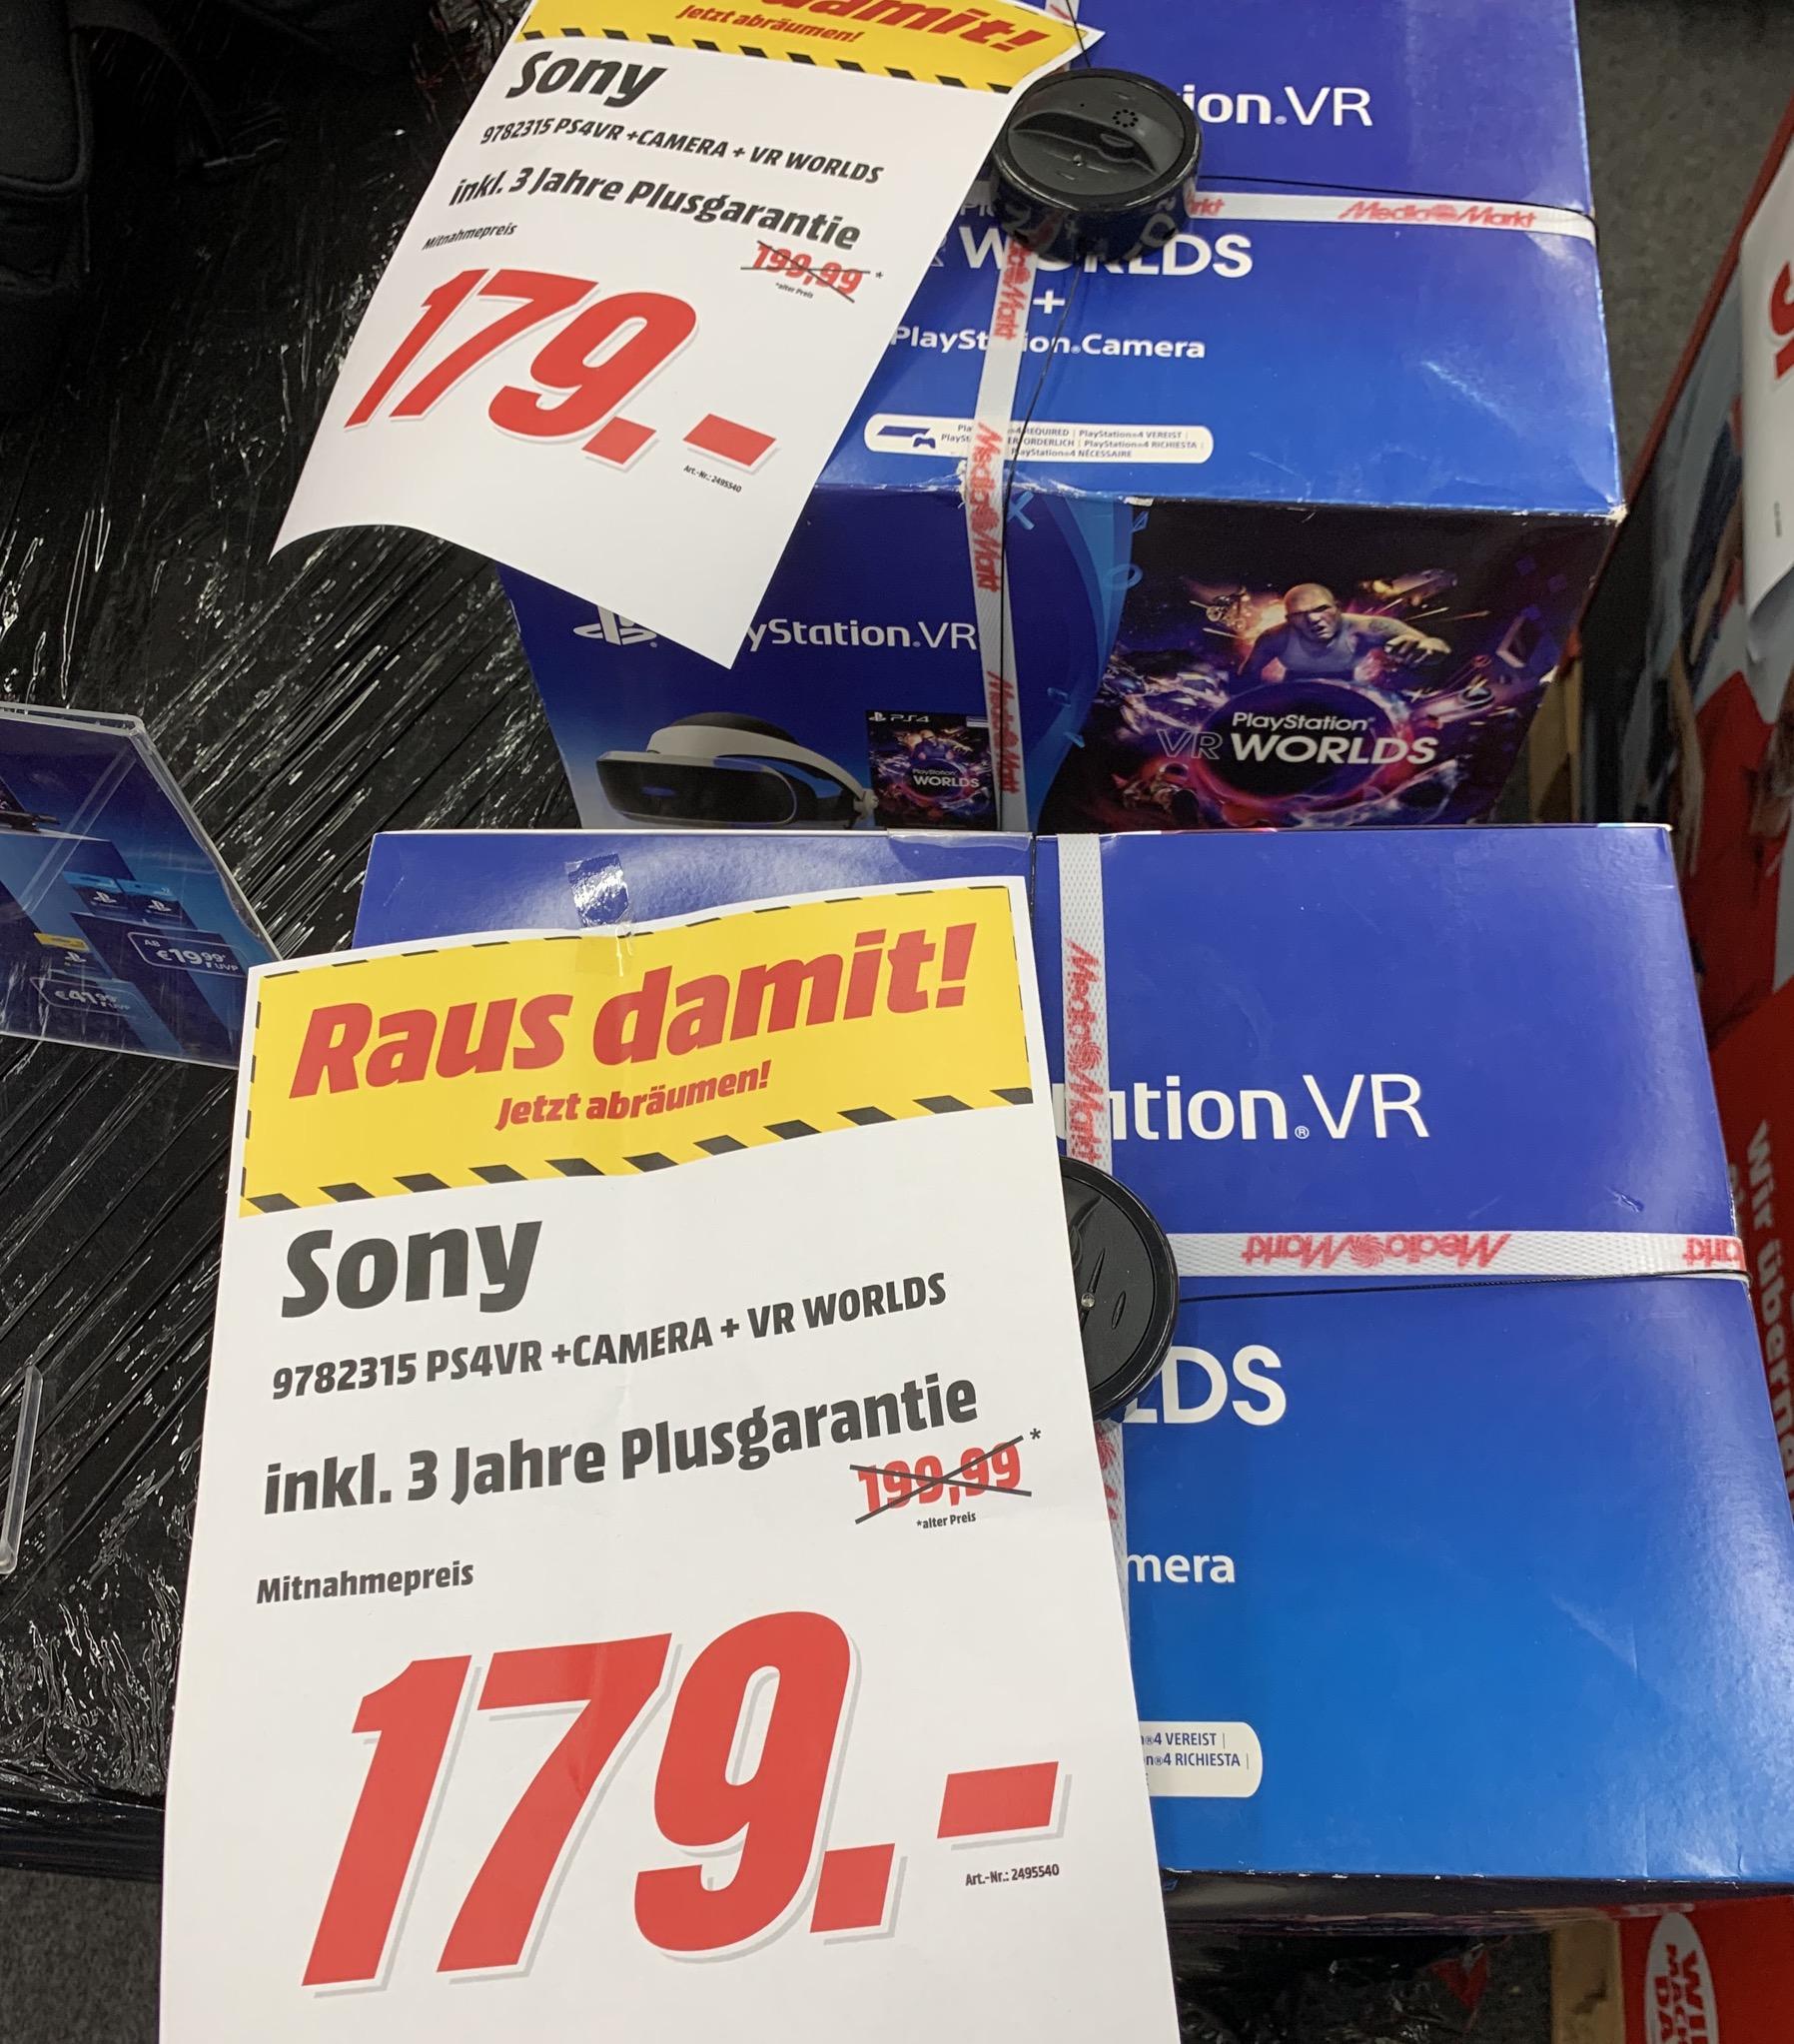 [Lokal Düsseldorf] Sony PlayStation VR V2 + Kamera + VR Worlds für 179€ im Media Markt Düsseldorf Arcaden